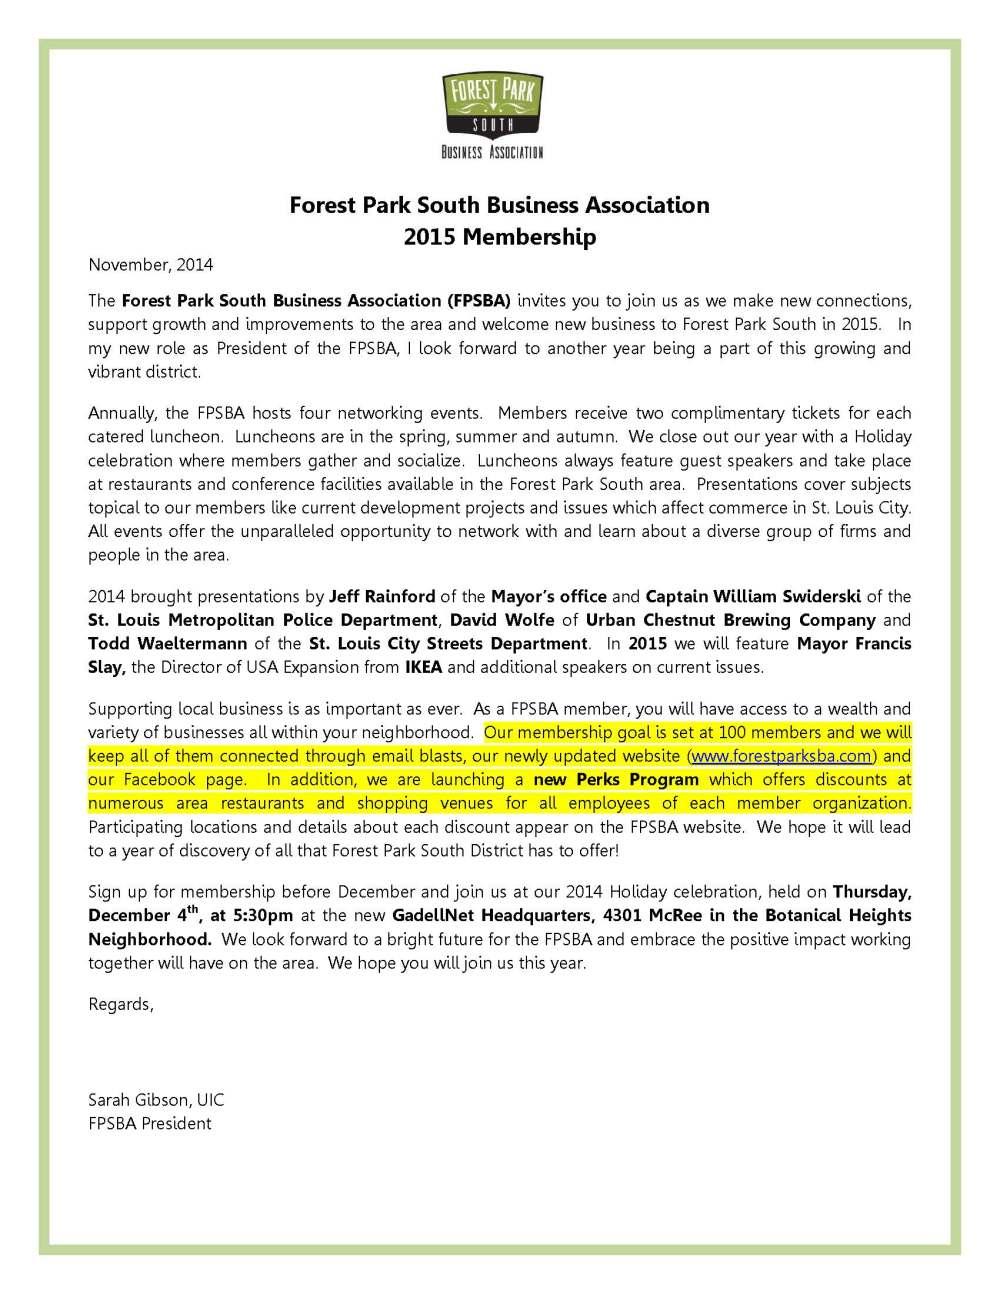 membership letter fpsba 2015 v3 10 30_Page_1